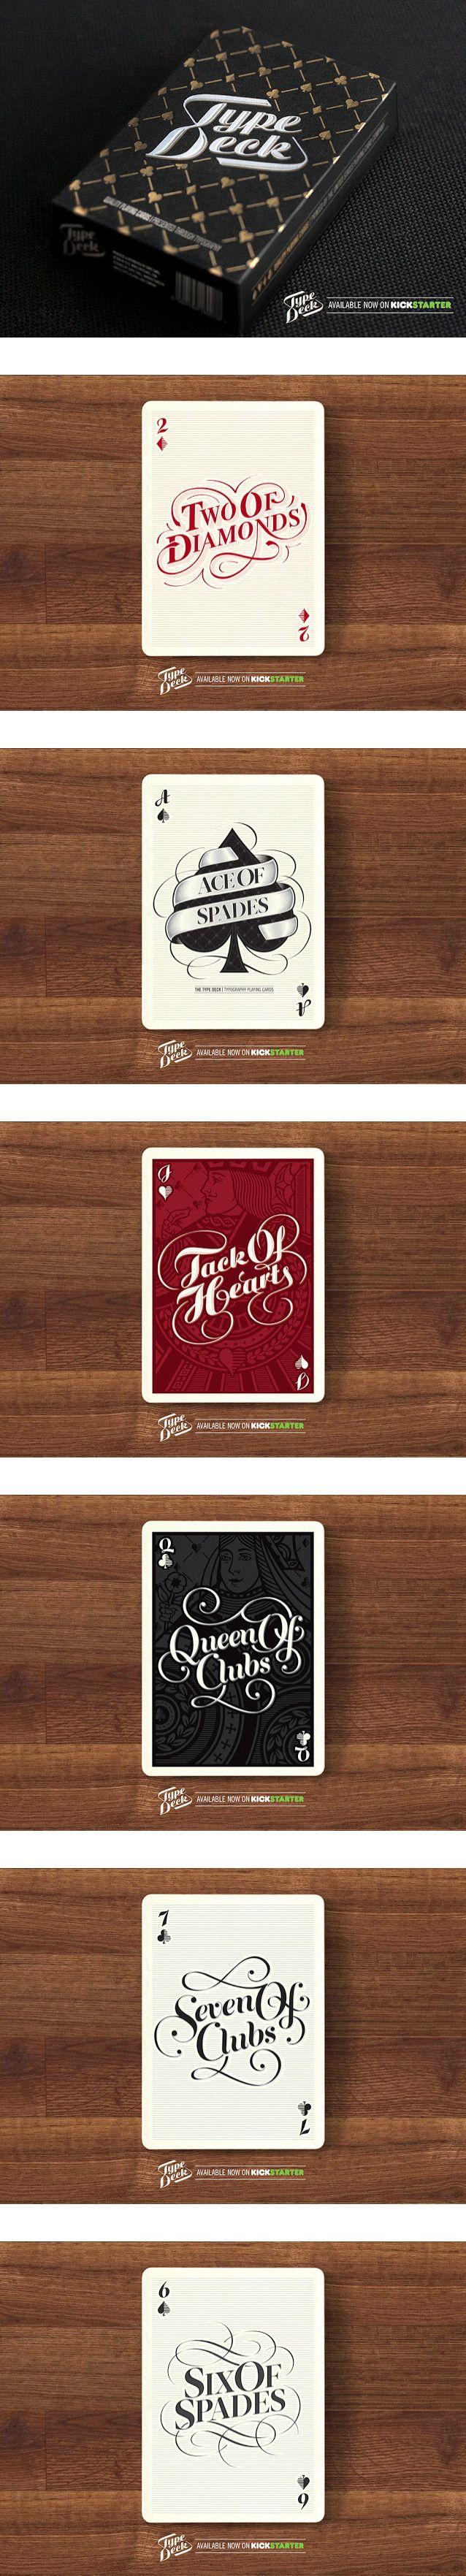 types of playing card decks